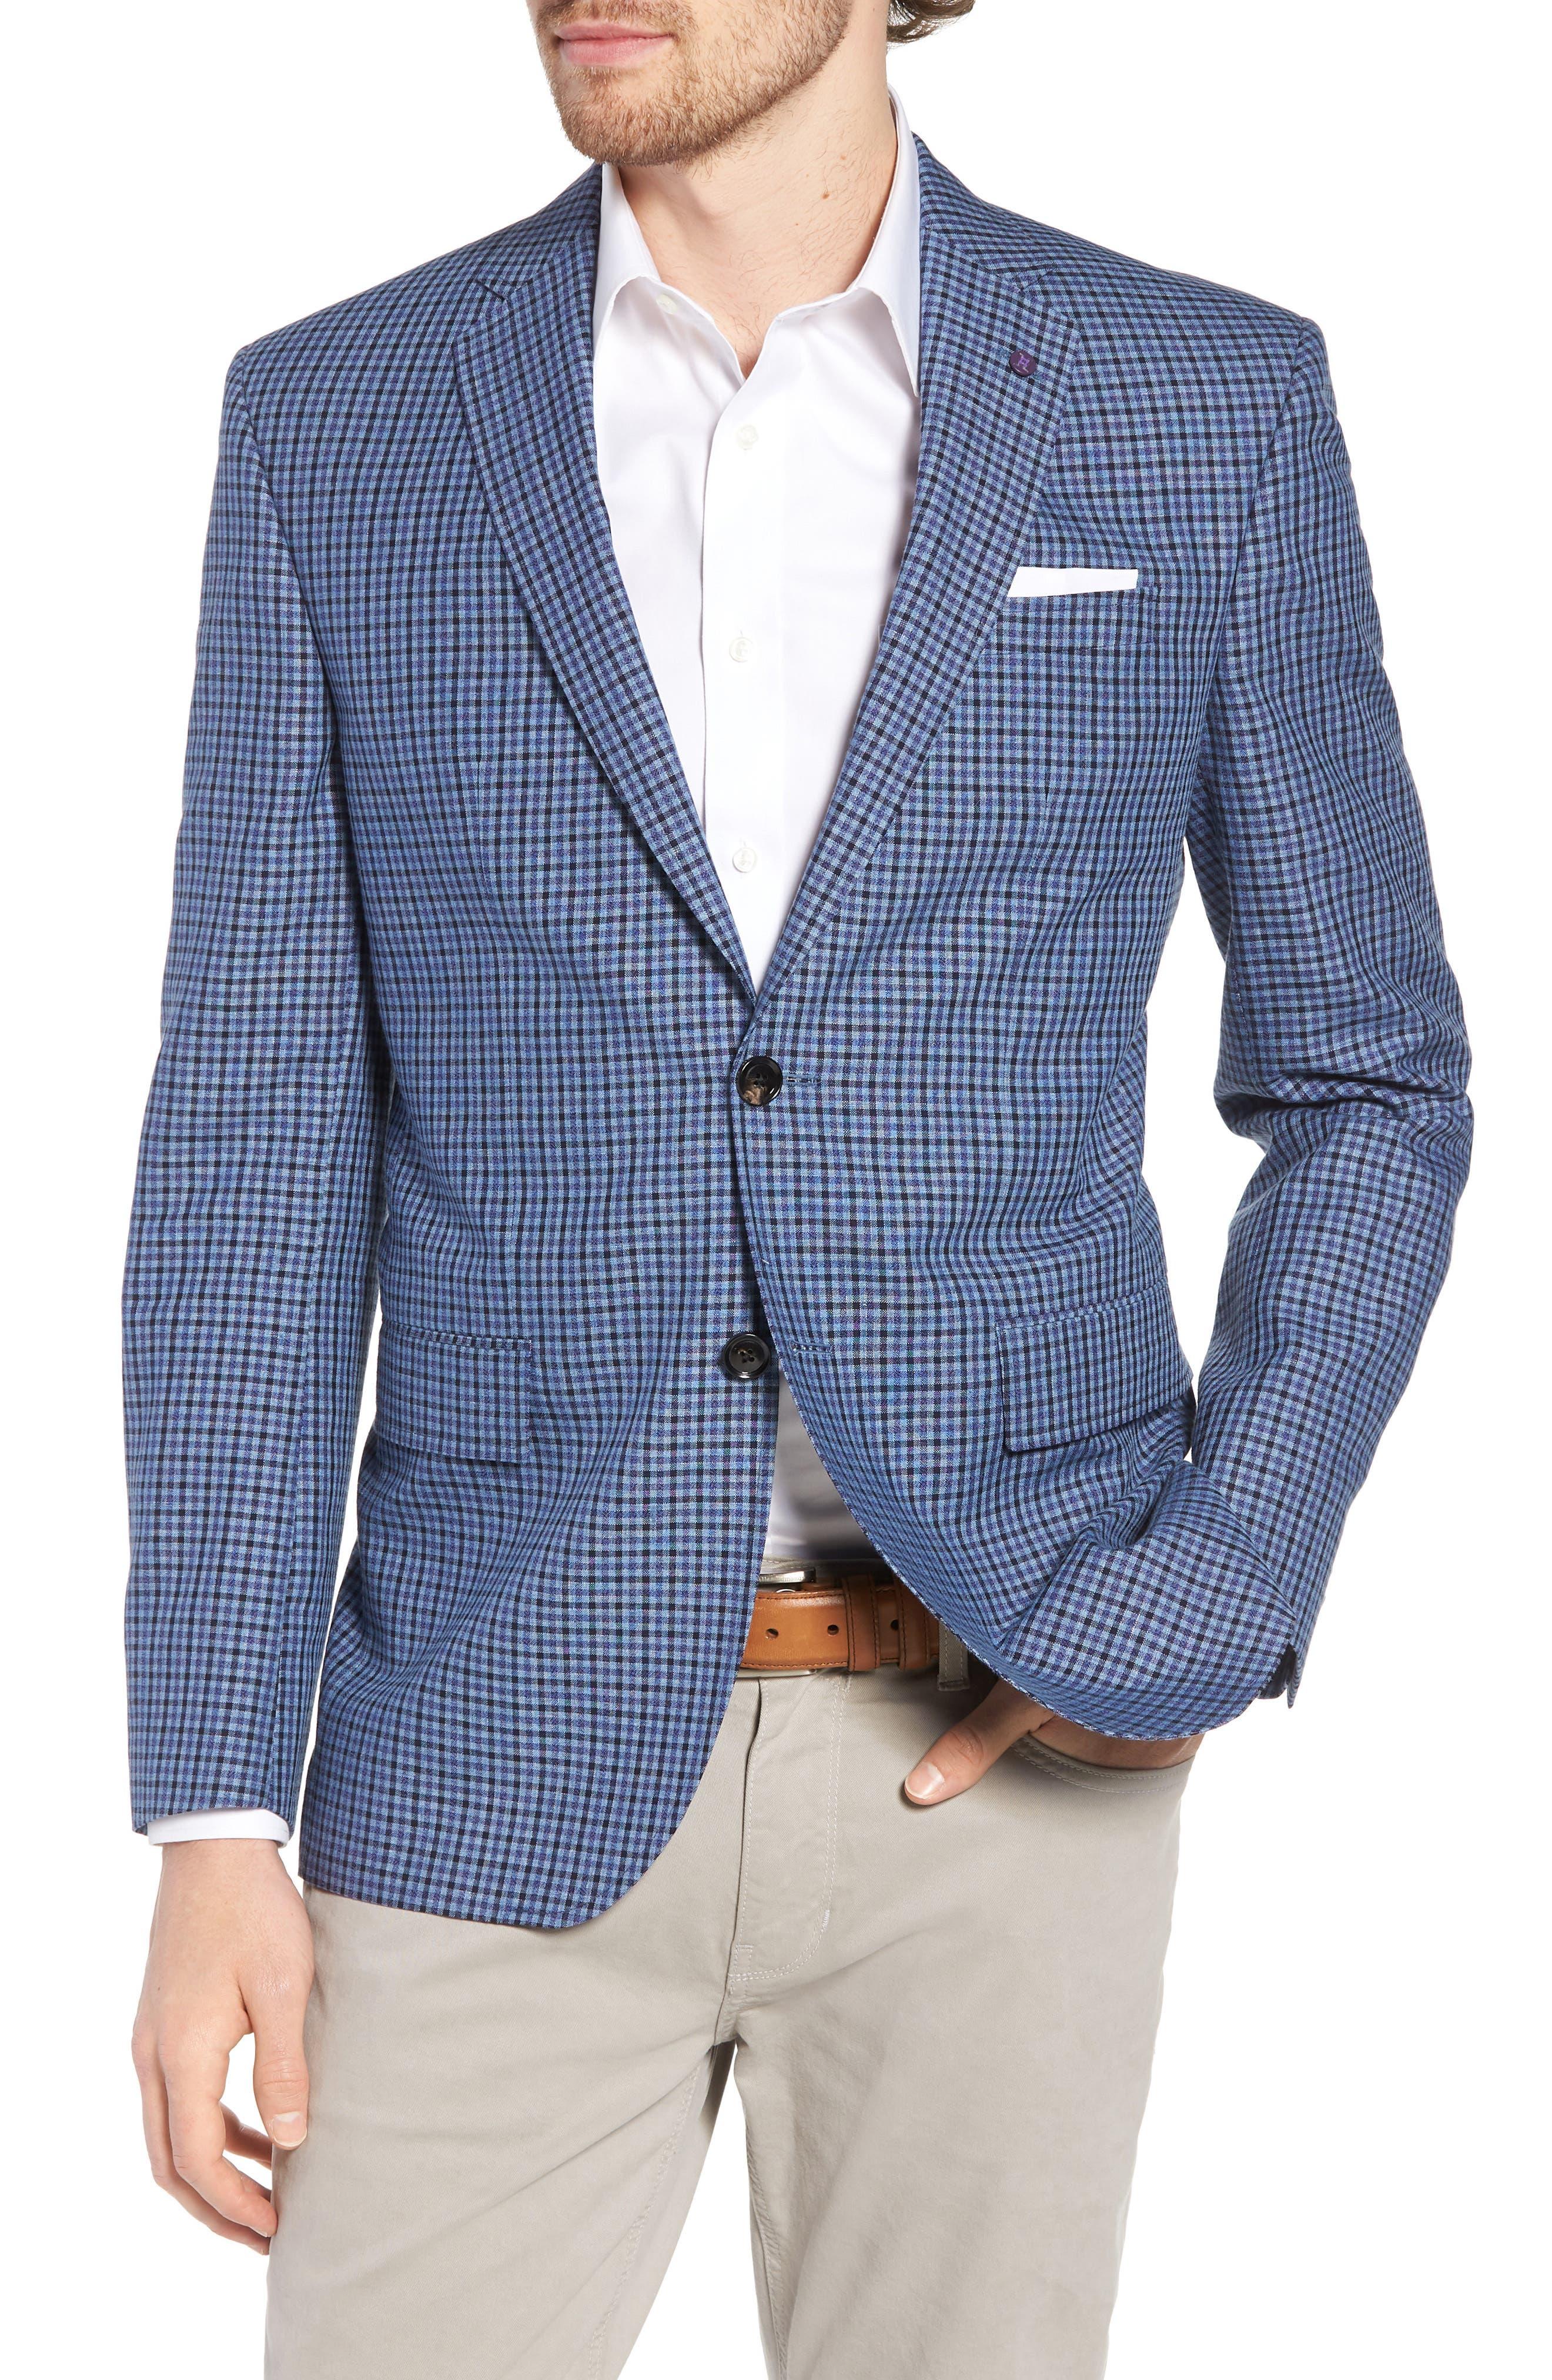 Jay Trim Fit Check Wool & Linen Sport Coat,                             Main thumbnail 1, color,                             400